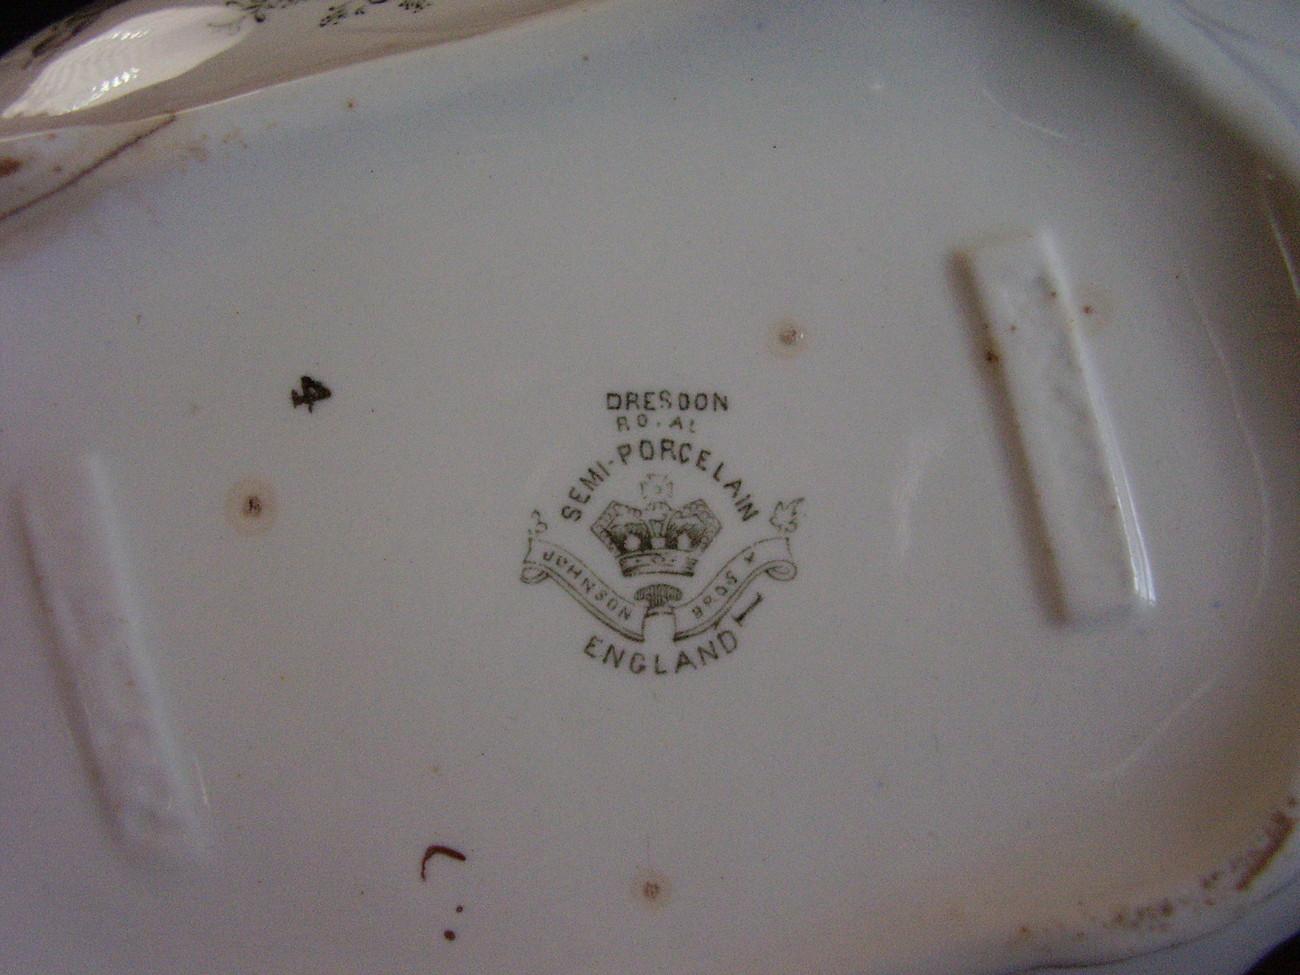 Dresdon SemiPorcelain Transferware Johnson Bros Covered Dish